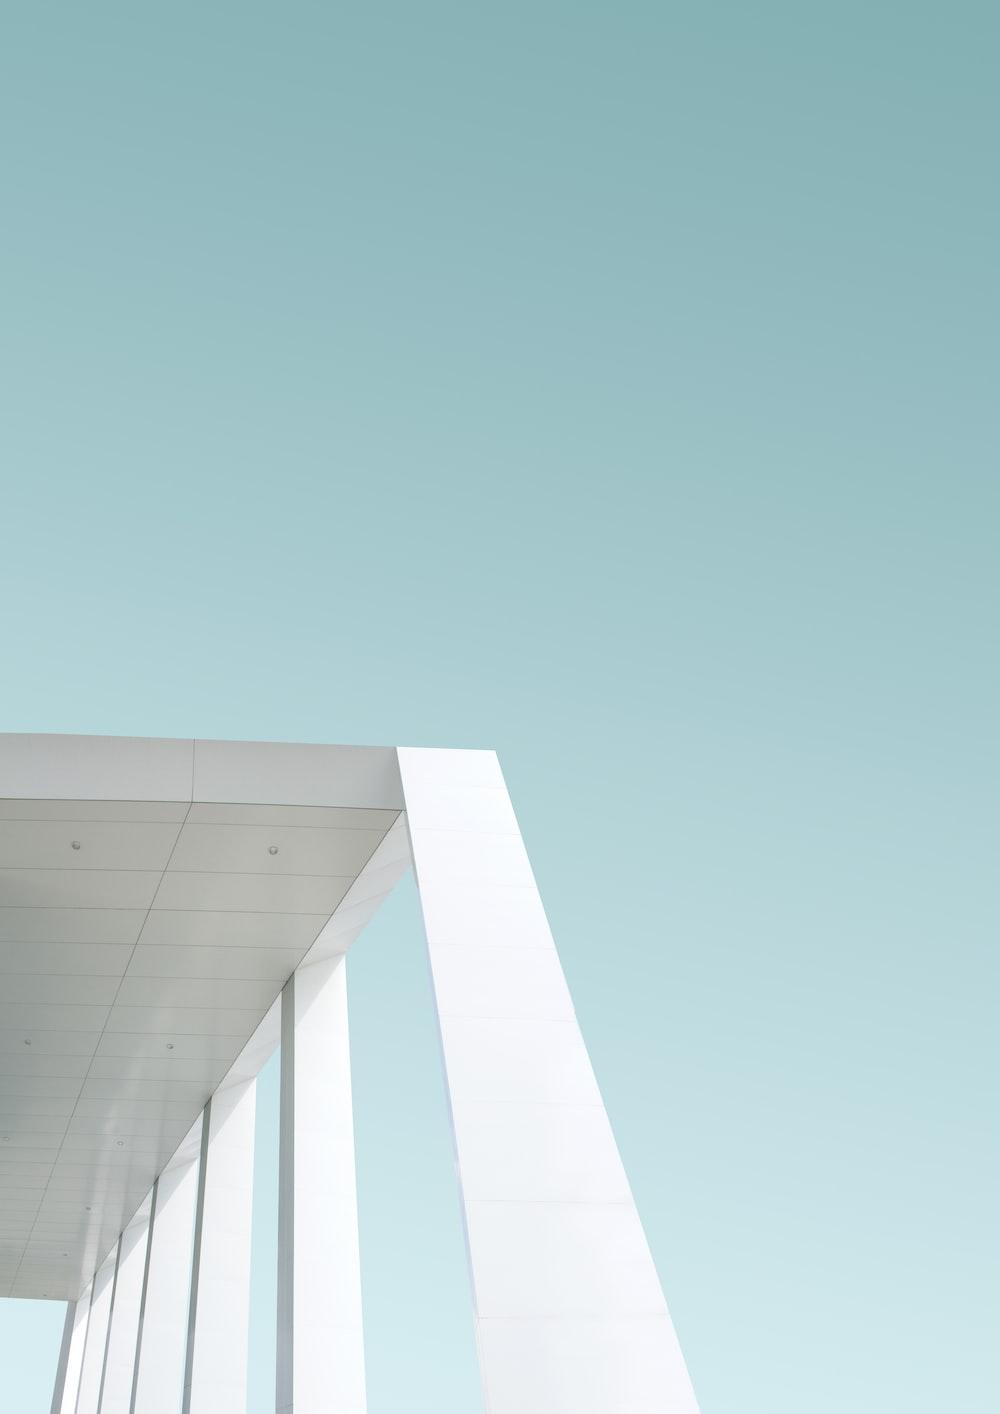 white architectural building